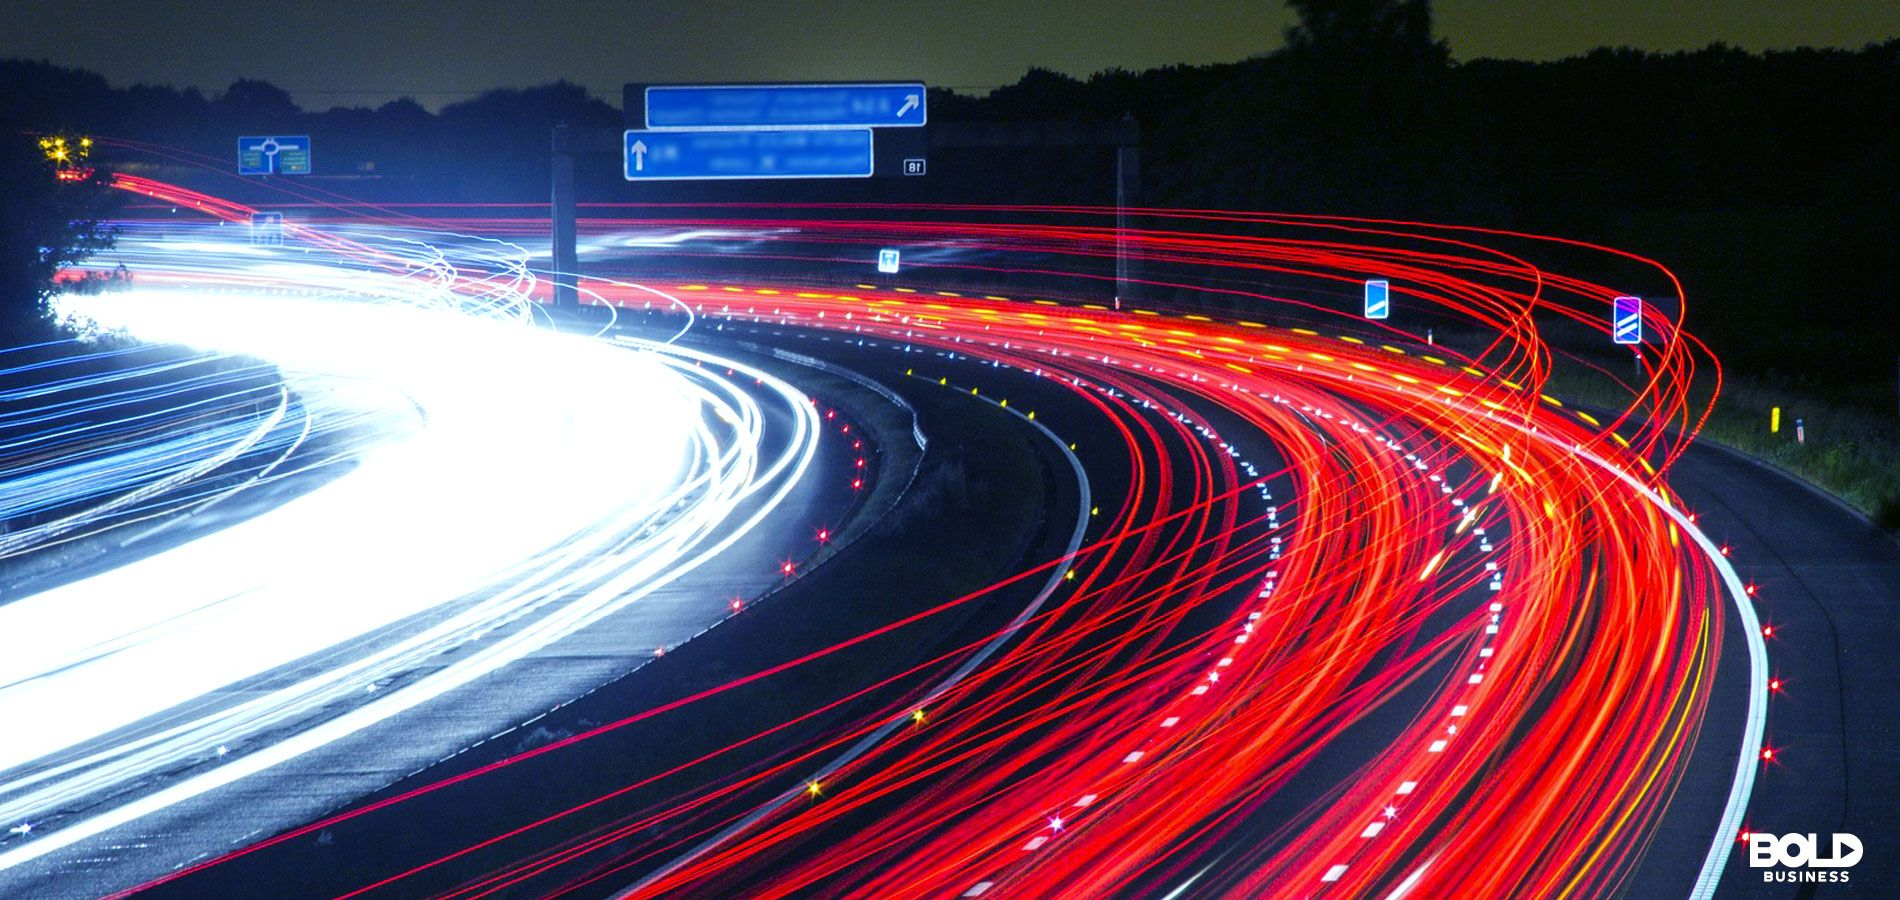 Intelligent transportation in the UK